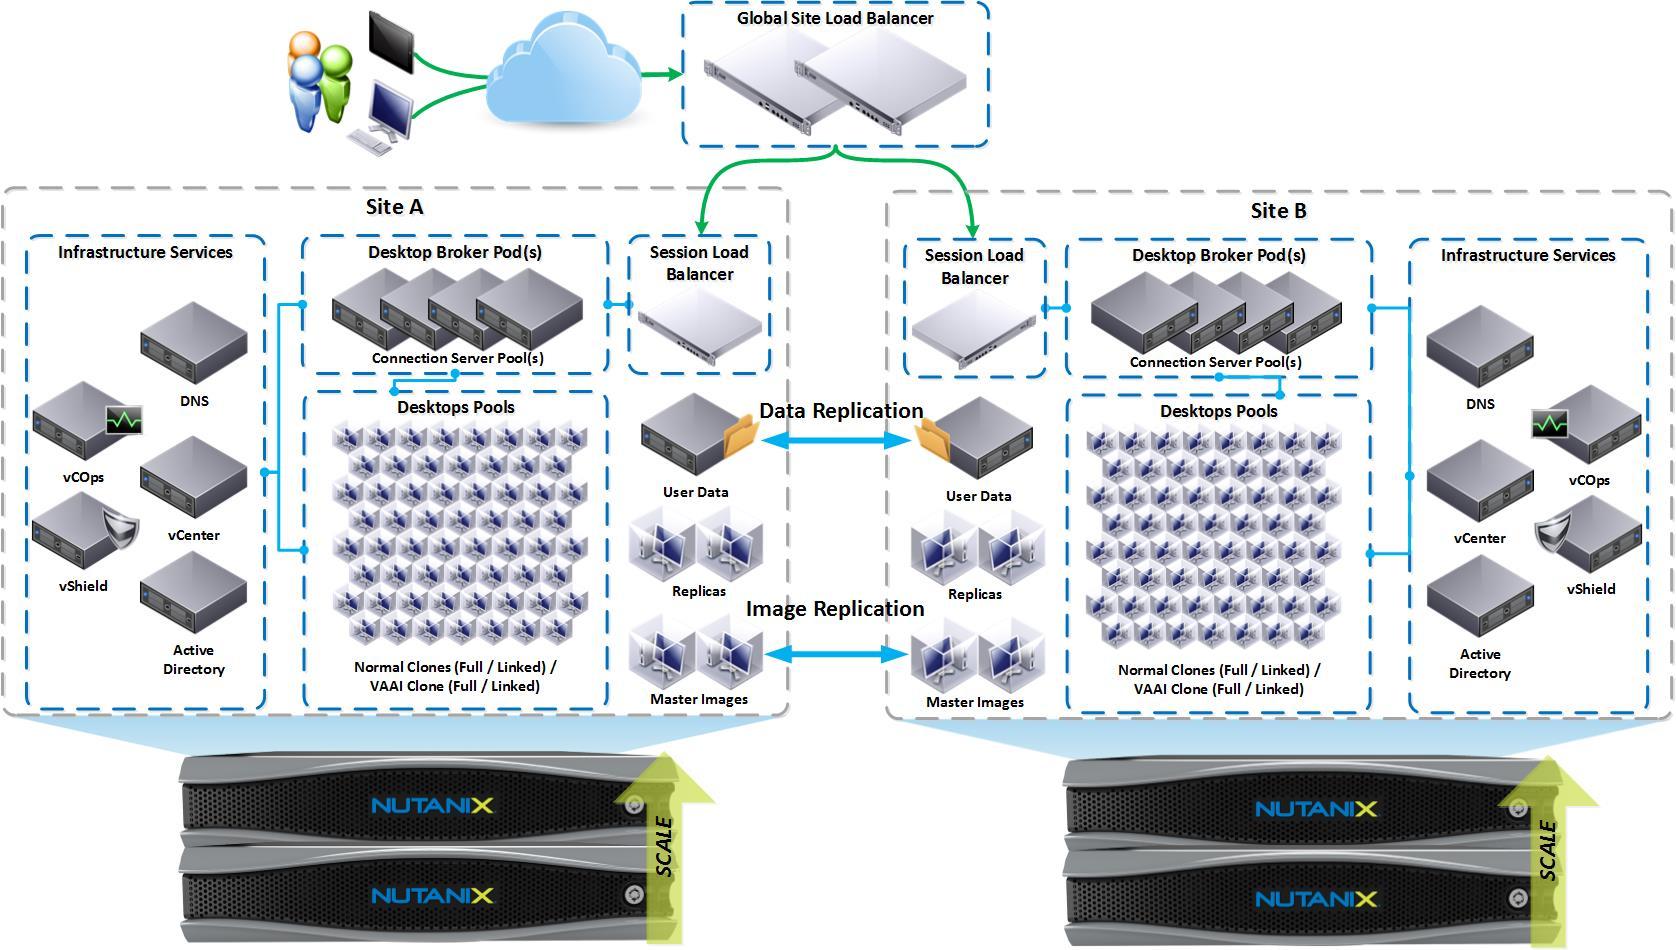 Nutanix Vdi Ex le Architecture For 20k To 200k Power User Desktops